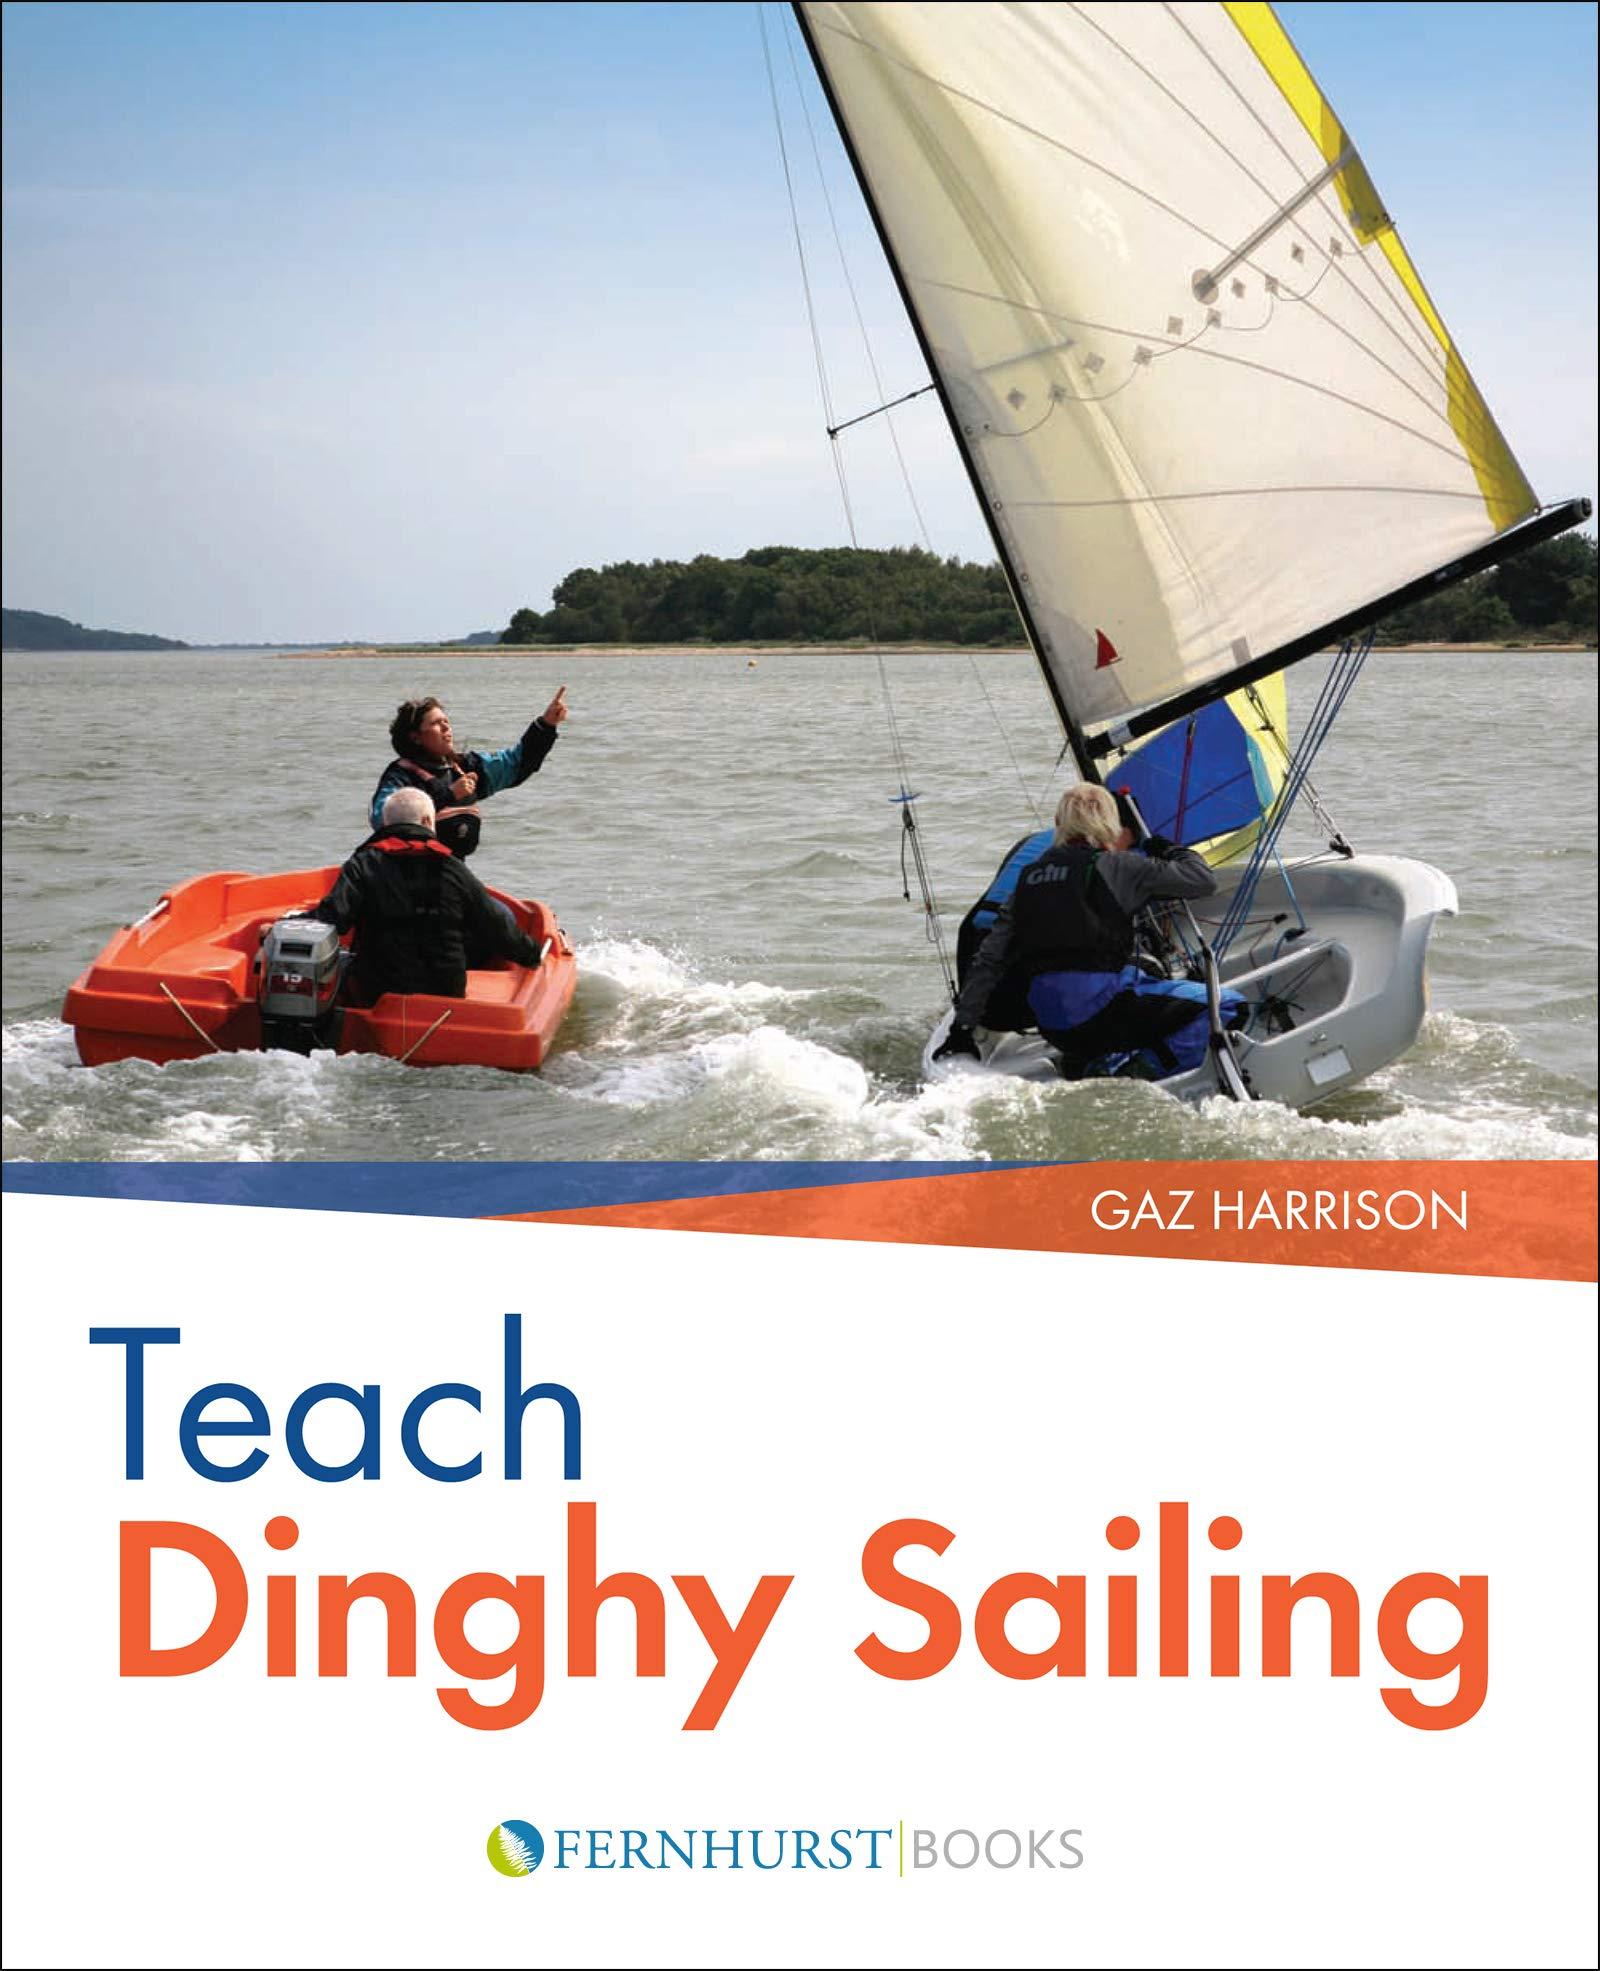 Teach Dinghy Sailing (Wiley Nautical): Amazon co uk: Gaz